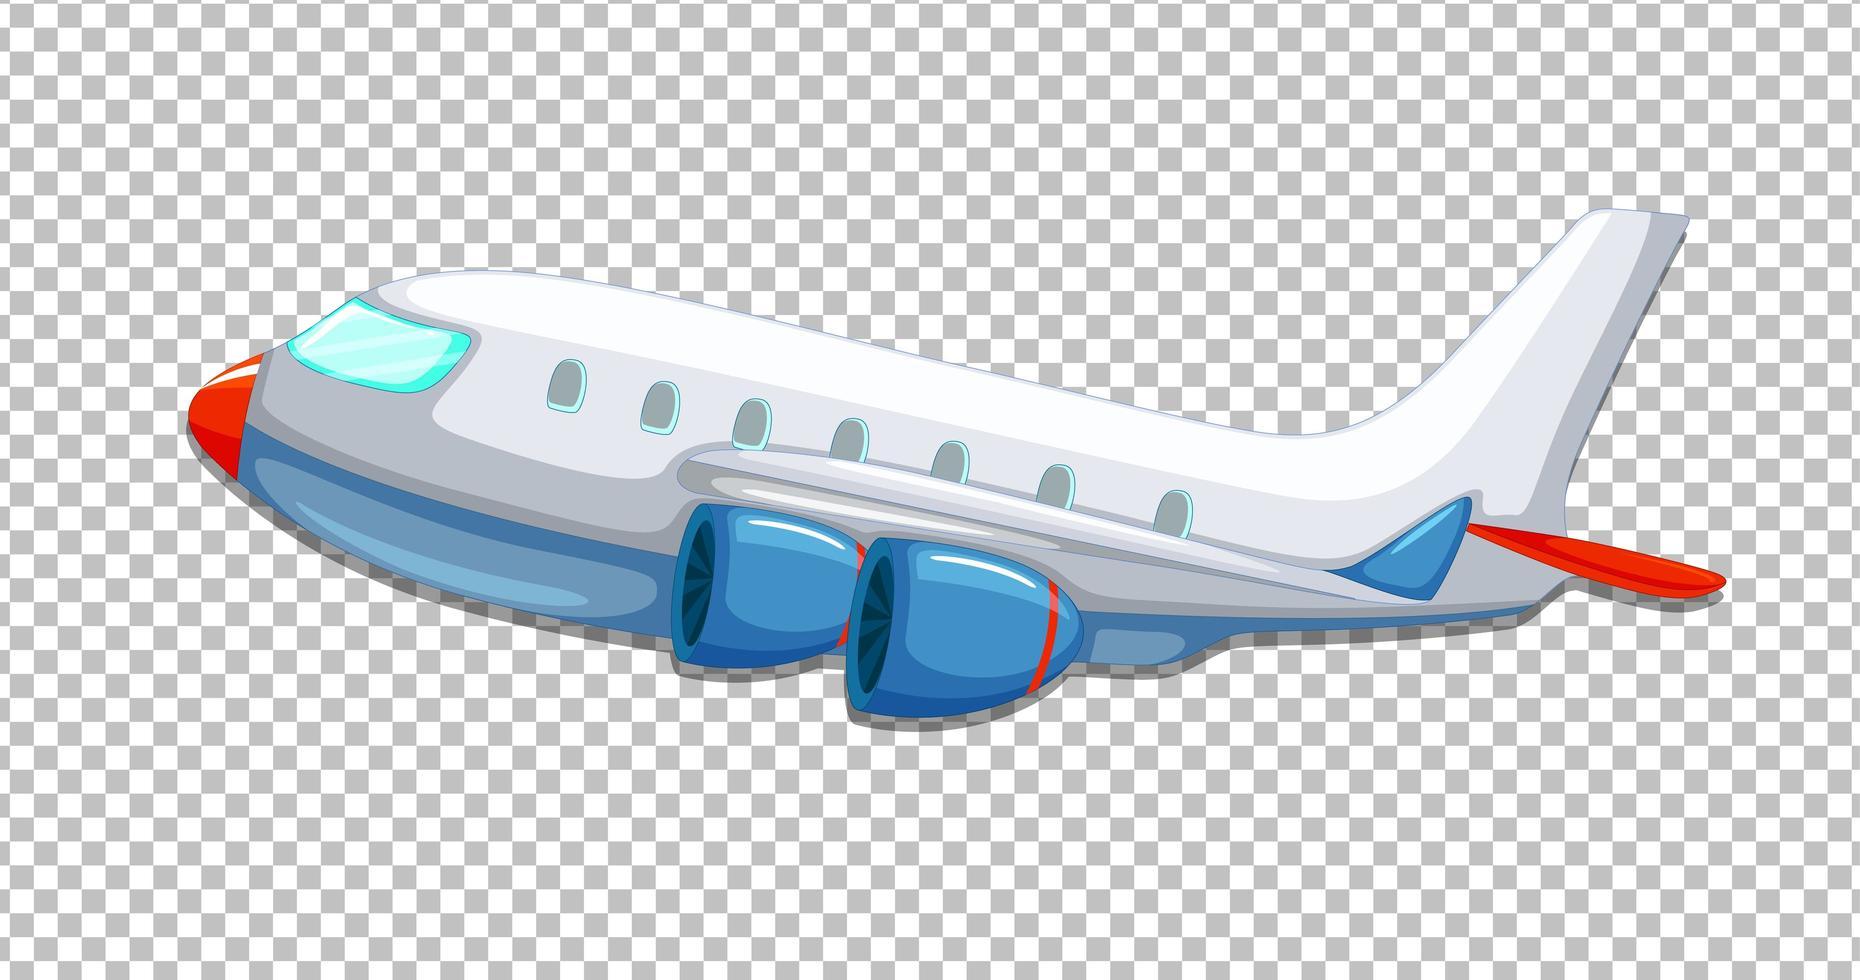 Flugzeugkarikaturstil auf transparentem Hintergrund vektor